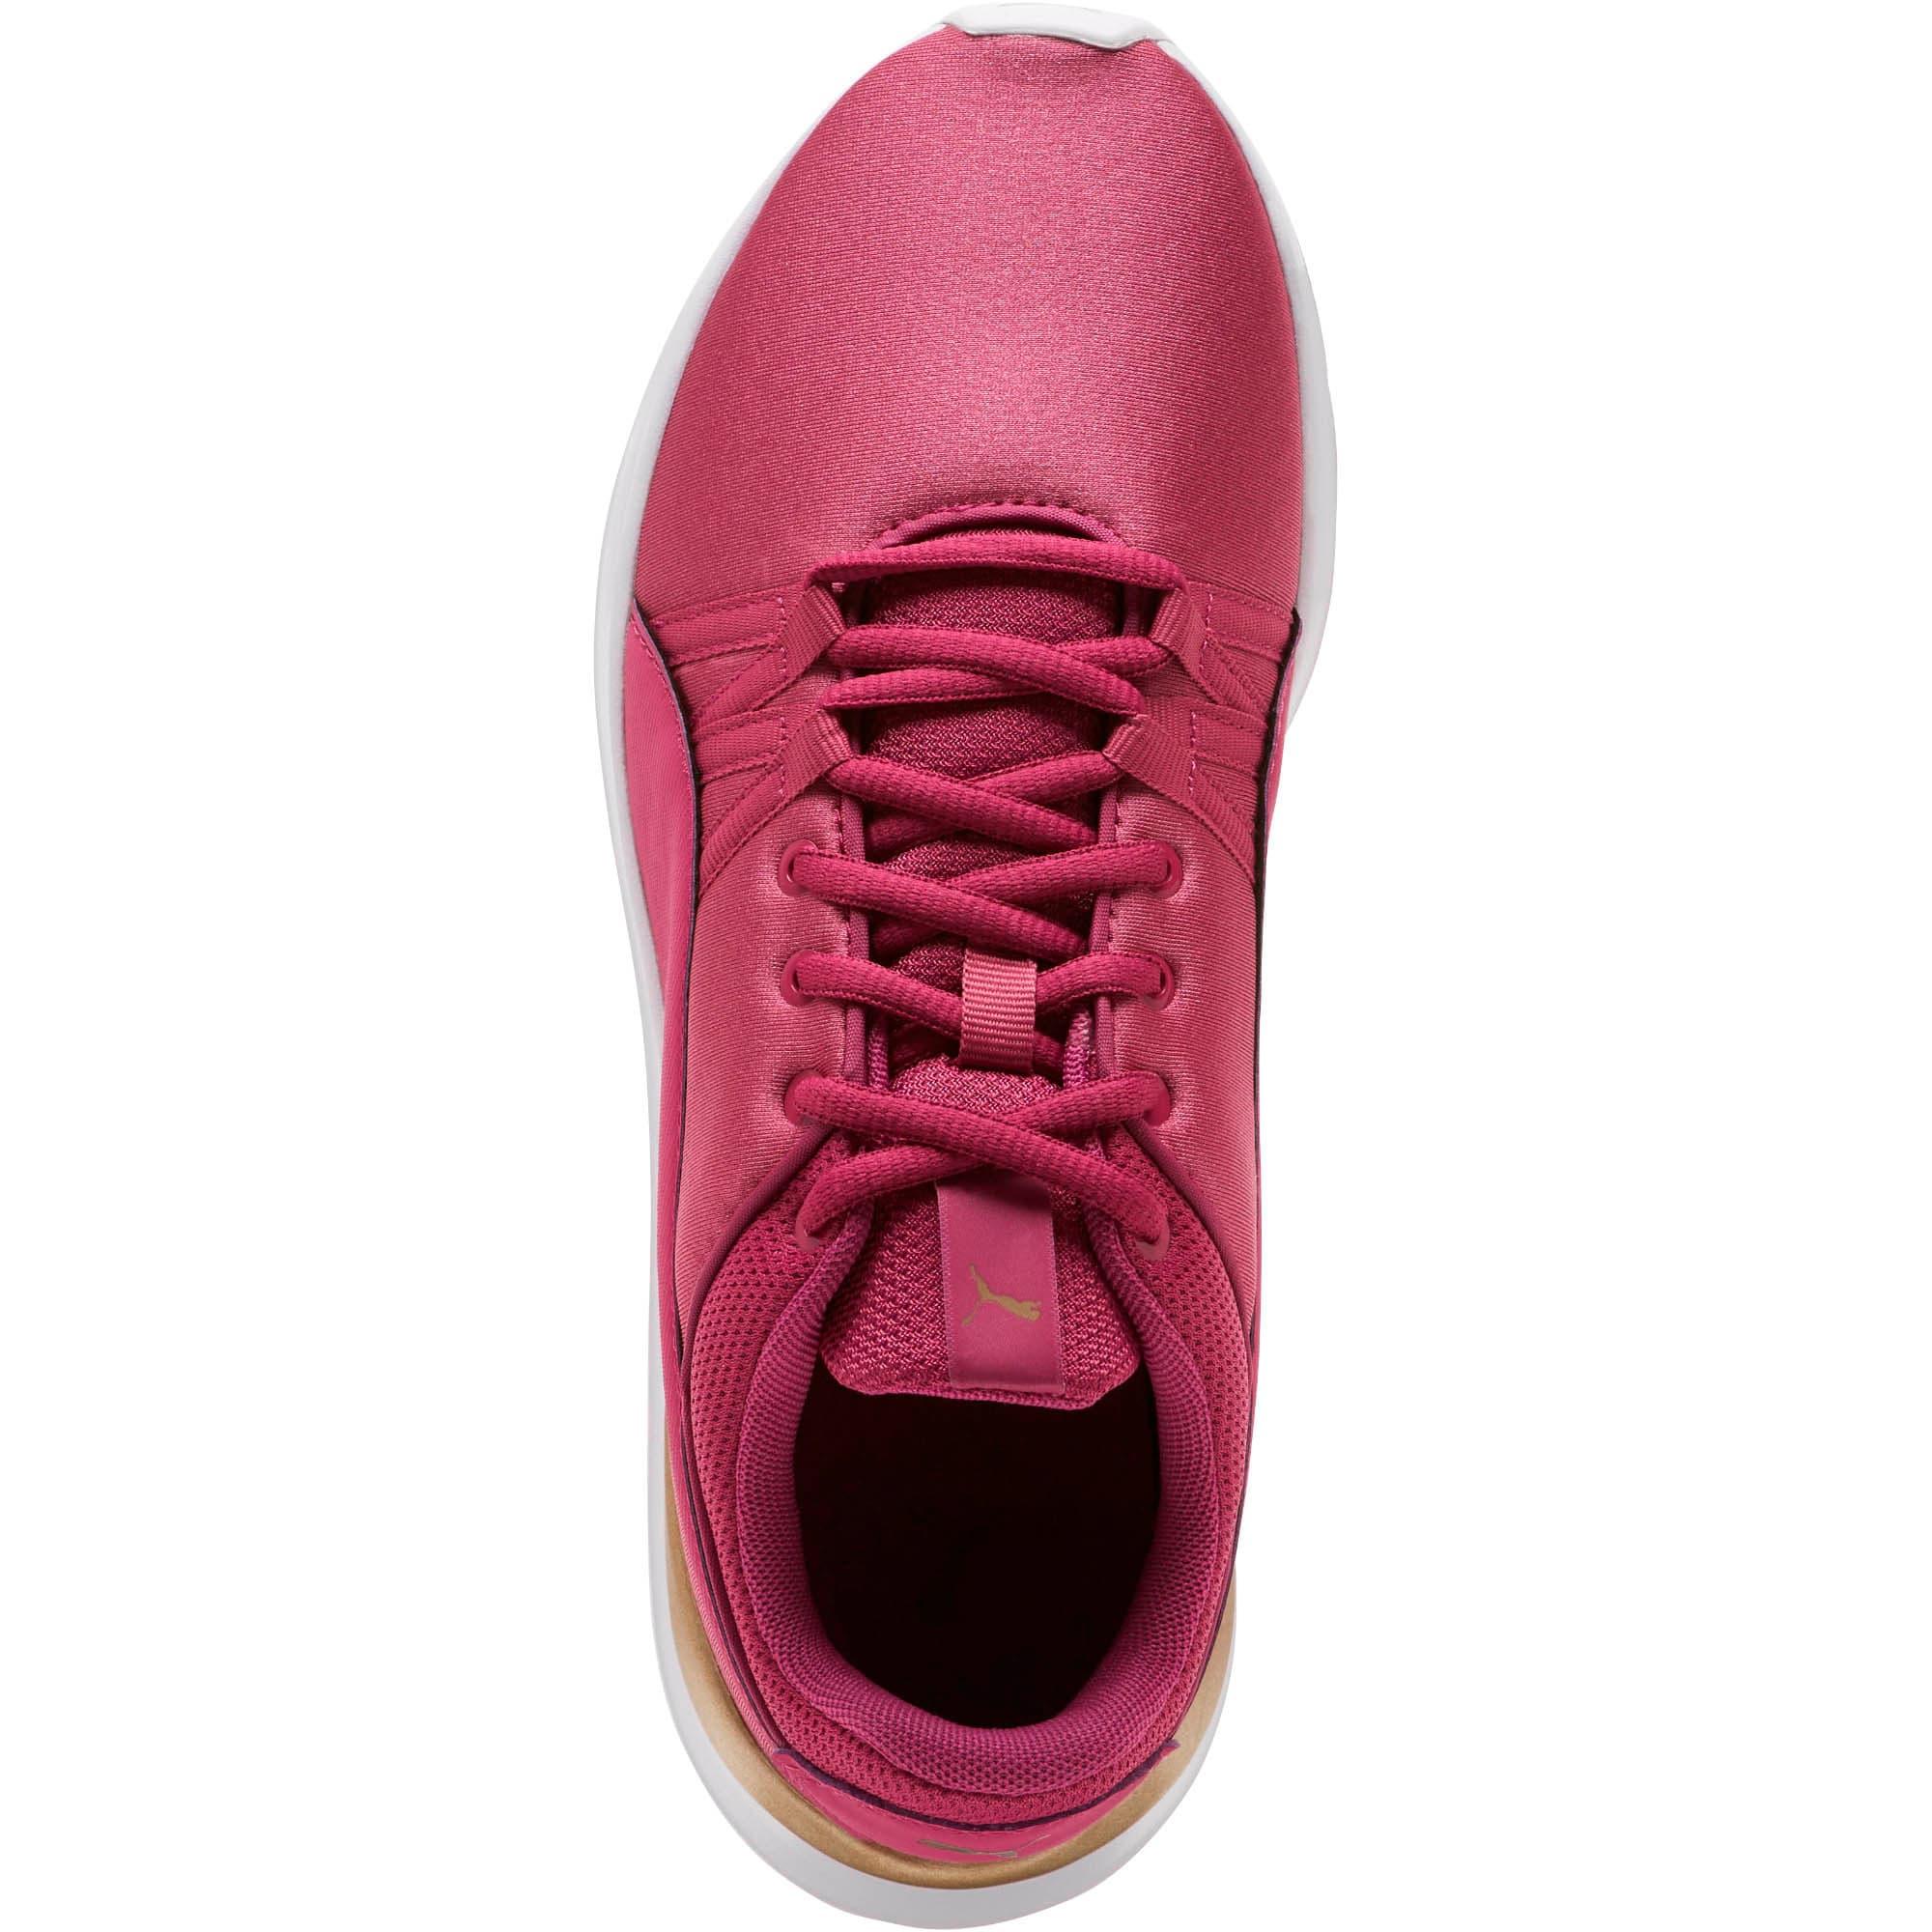 Thumbnail 5 of Adela Women's Sneakers, Magenta Haze-Magenta Haze, medium